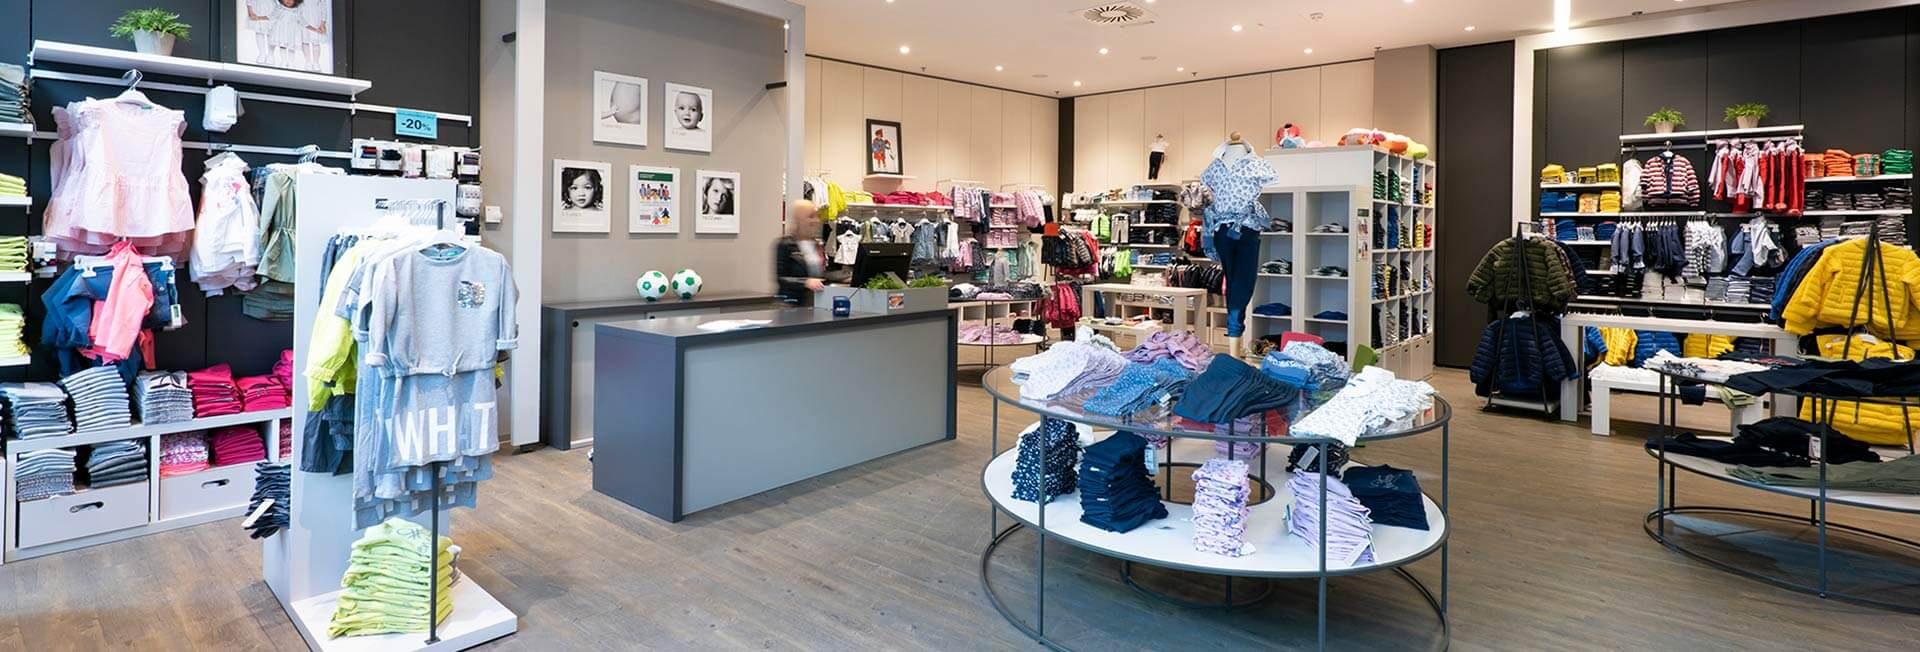 Benetton im Kaufhaus Tyrol